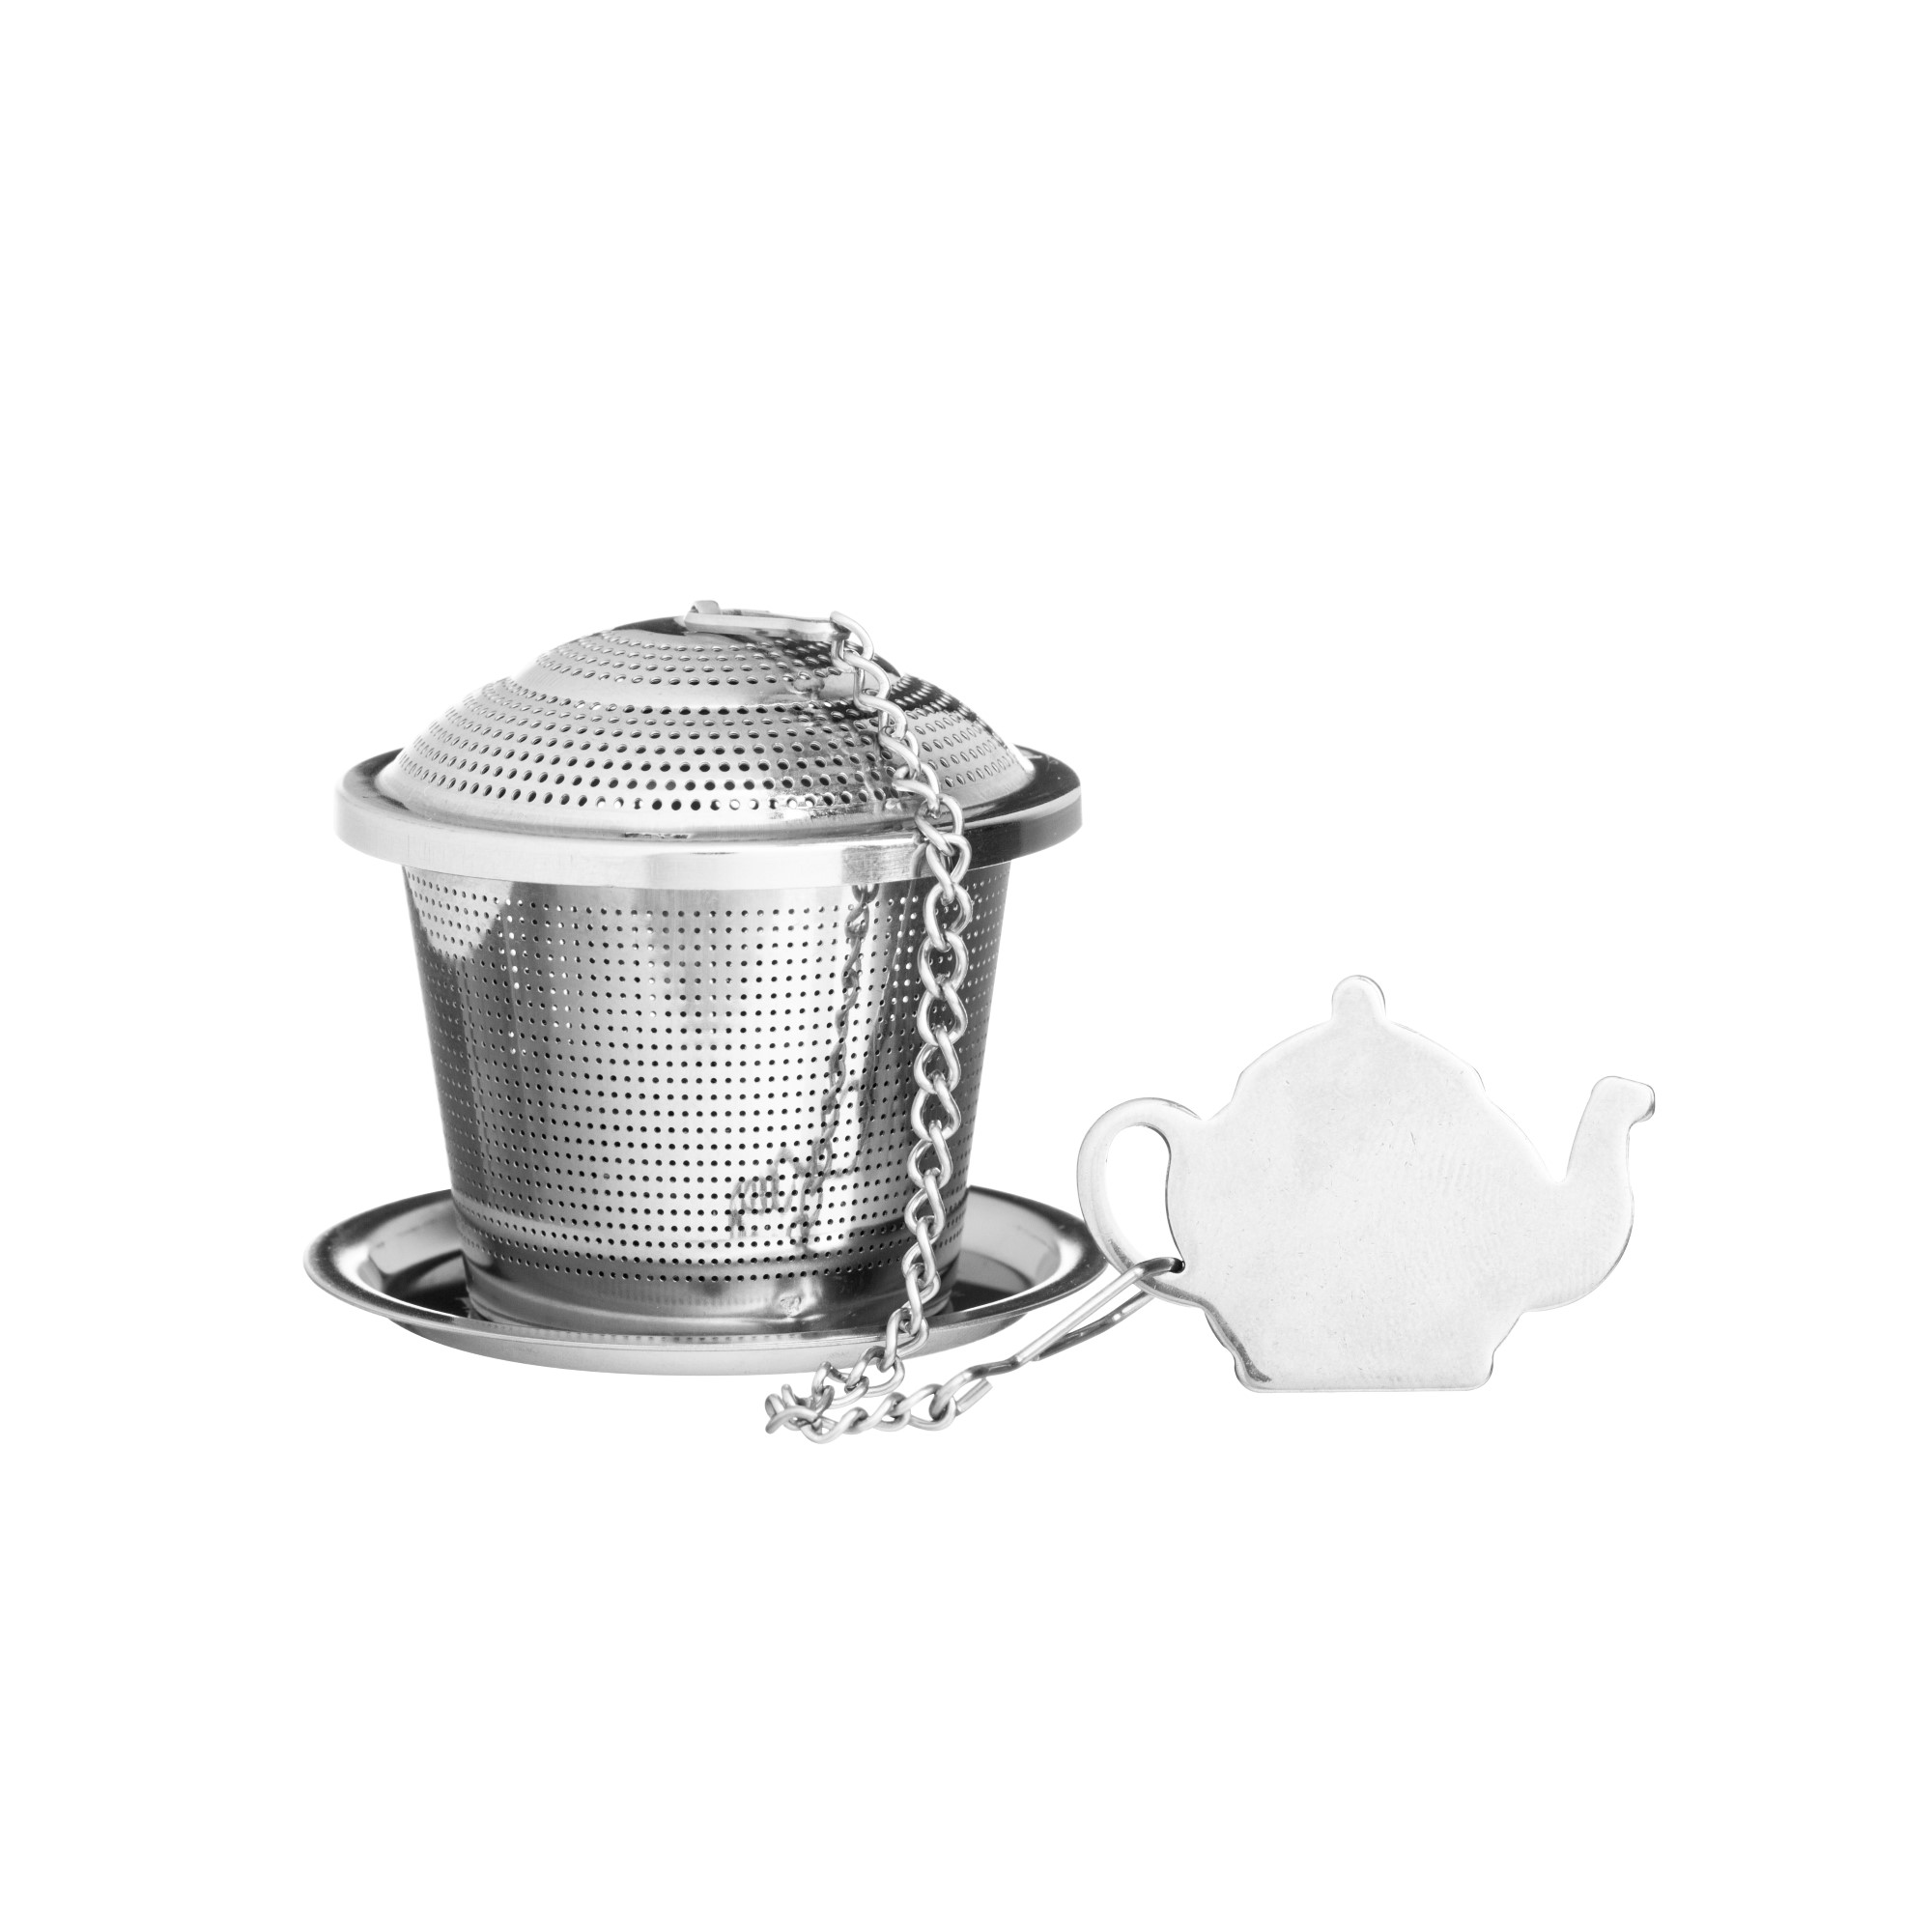 Price & Kensington Tea Infuser with Drip Tray